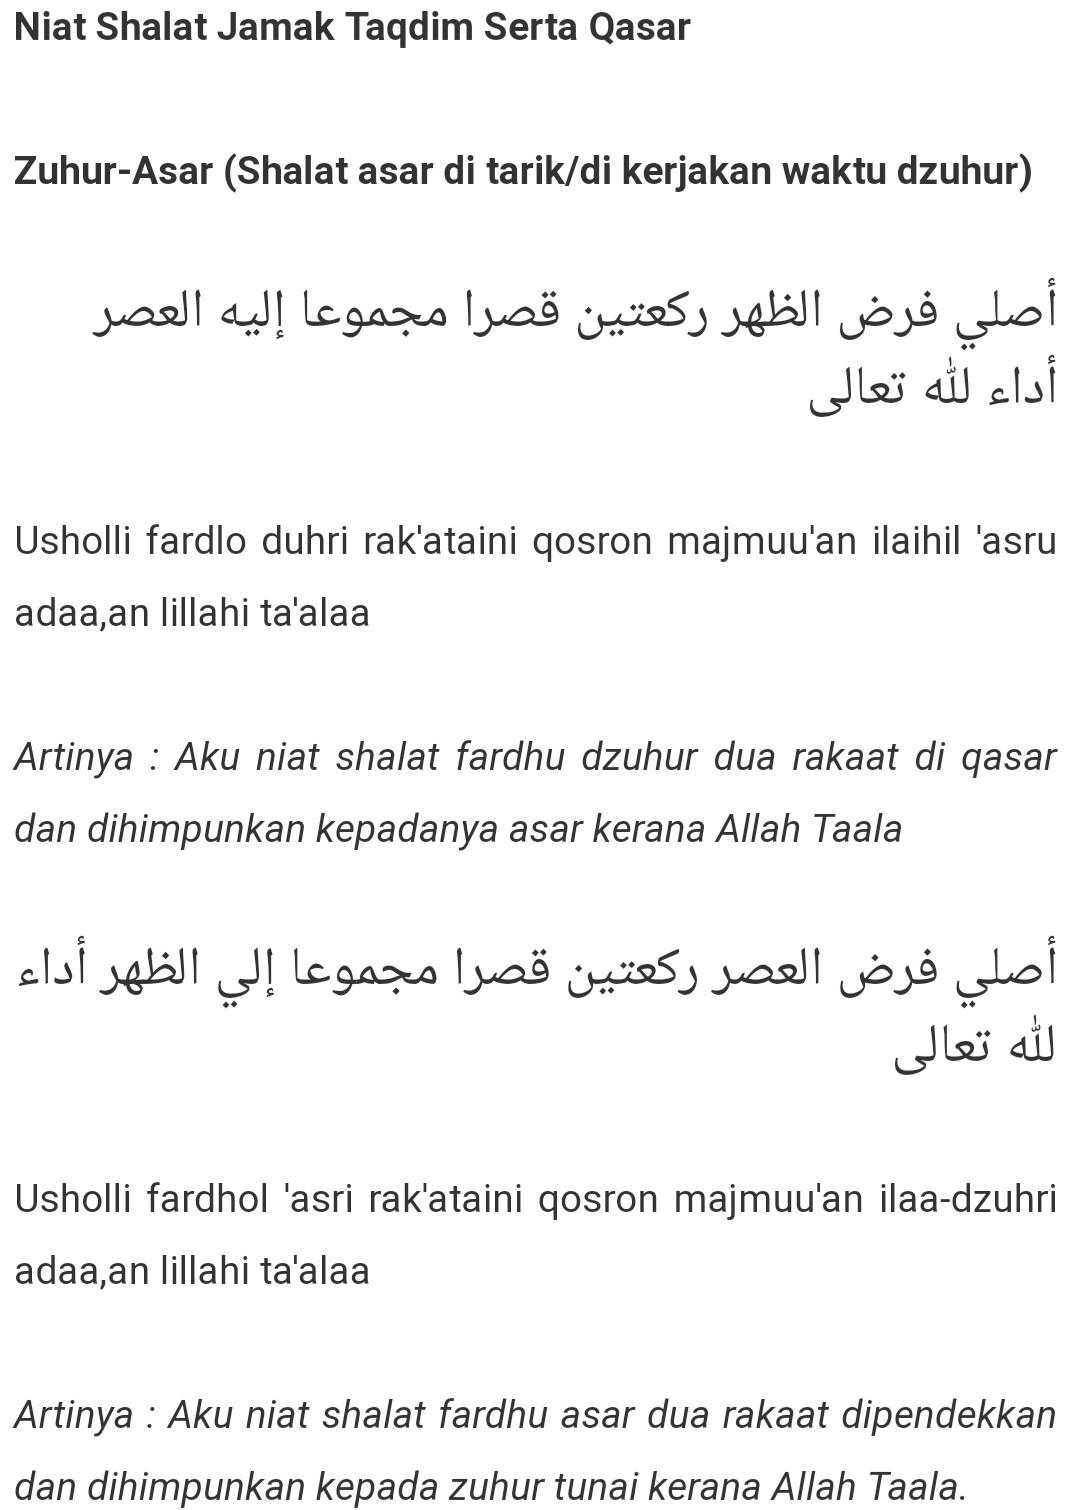 Tuliskan Niat Shalat Jamak Taqdim Maghrib Dan Isya : tuliskan, shalat, jamak, taqdim, maghrib, Sholat, Jamak, Takhir, Maghrib, Waktu, Sedang